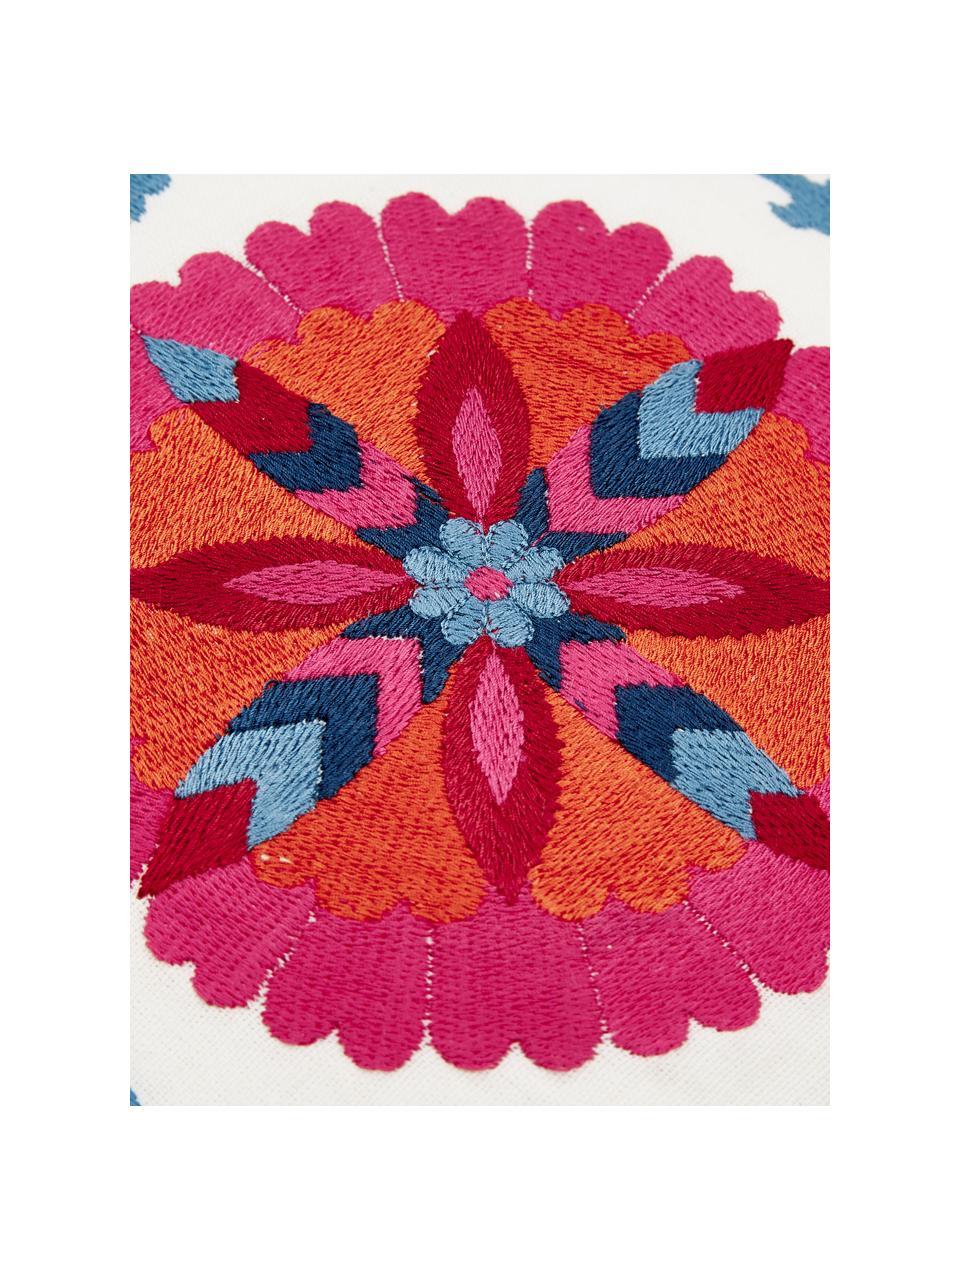 Bestickte Kissenhülle Tabula, 100% Baumwolle, Cremeweiß, Mehrfarbig, 30 x 50 cm